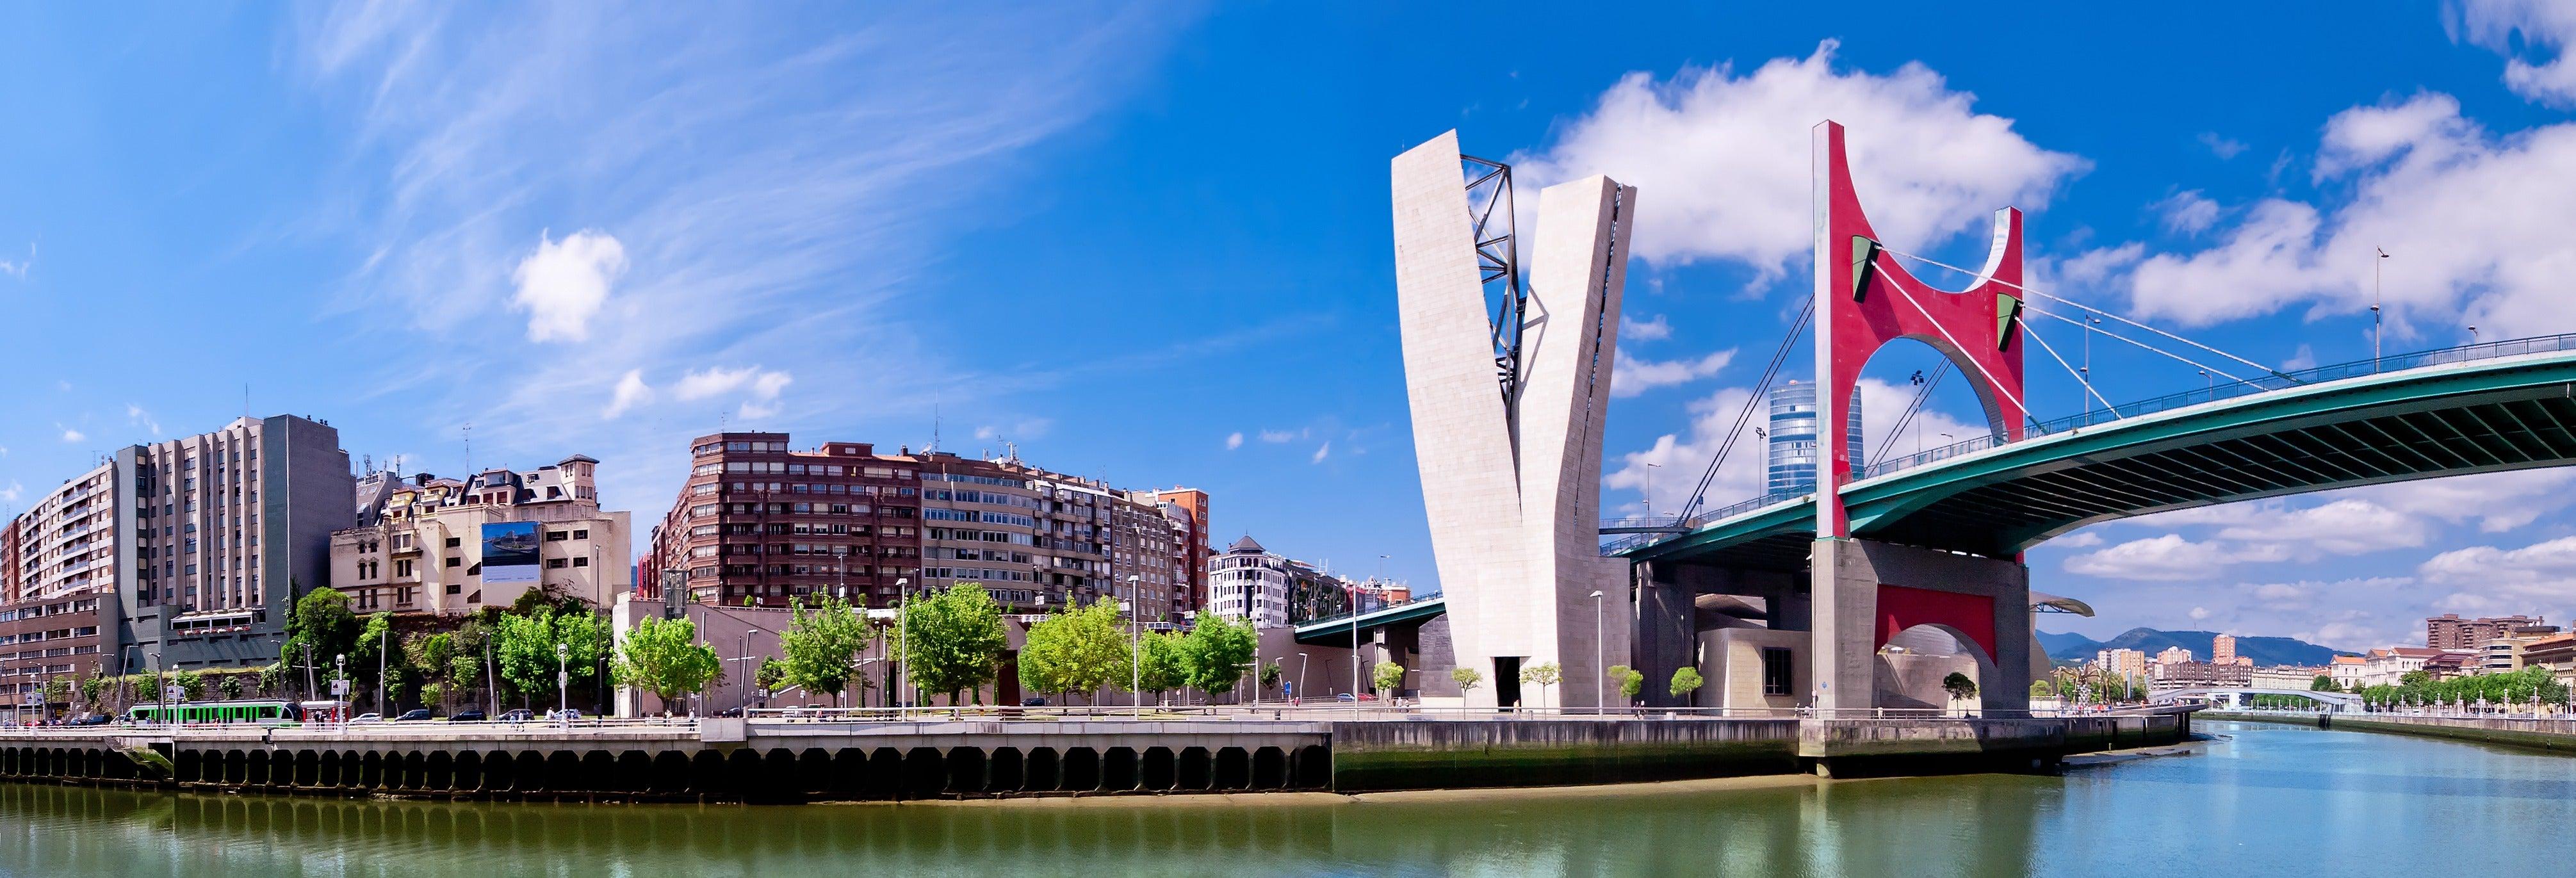 Barco turístico pela Ria de Bilbao e pela Baía do Abra